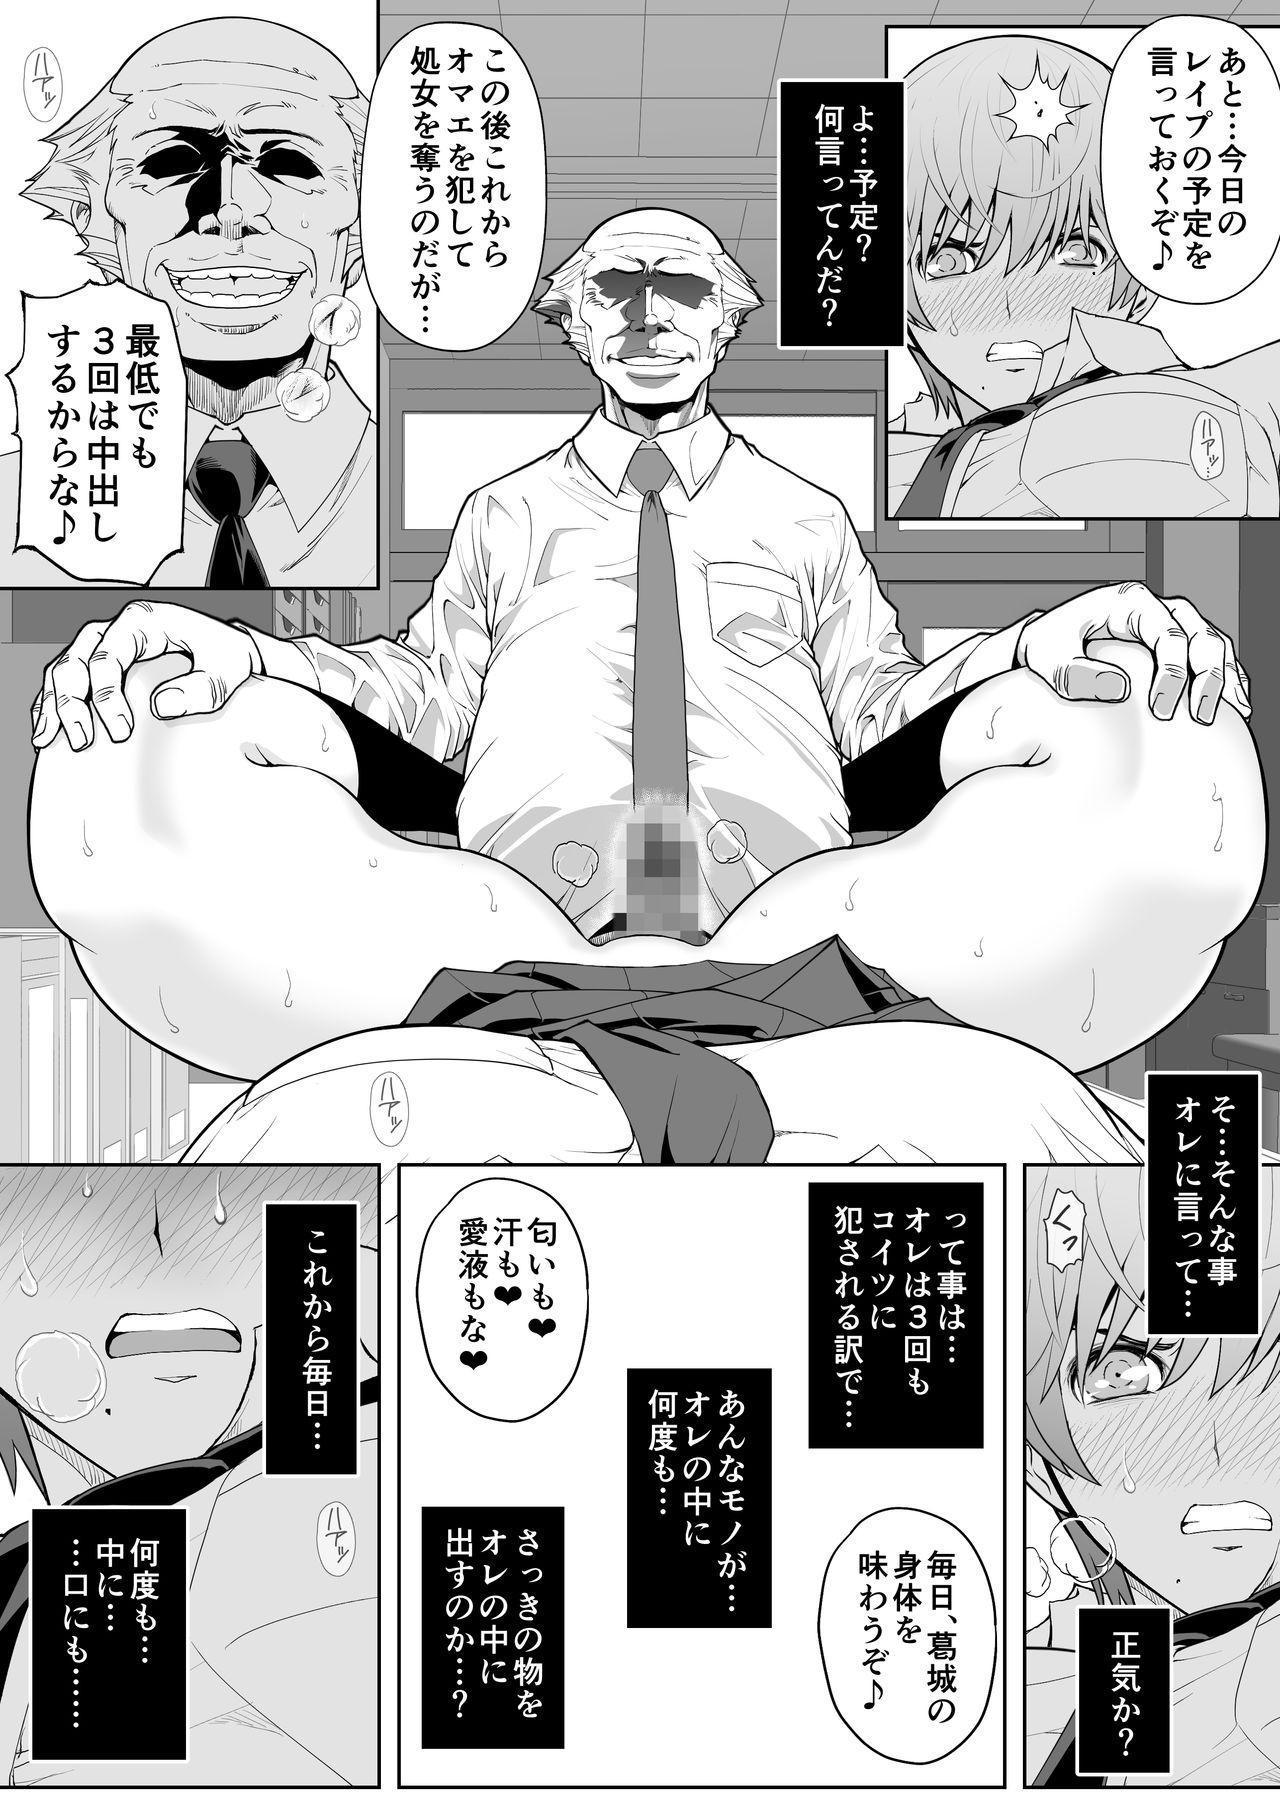 Namaiki mmusume ni tsuyo ● ikīki jugyō 38